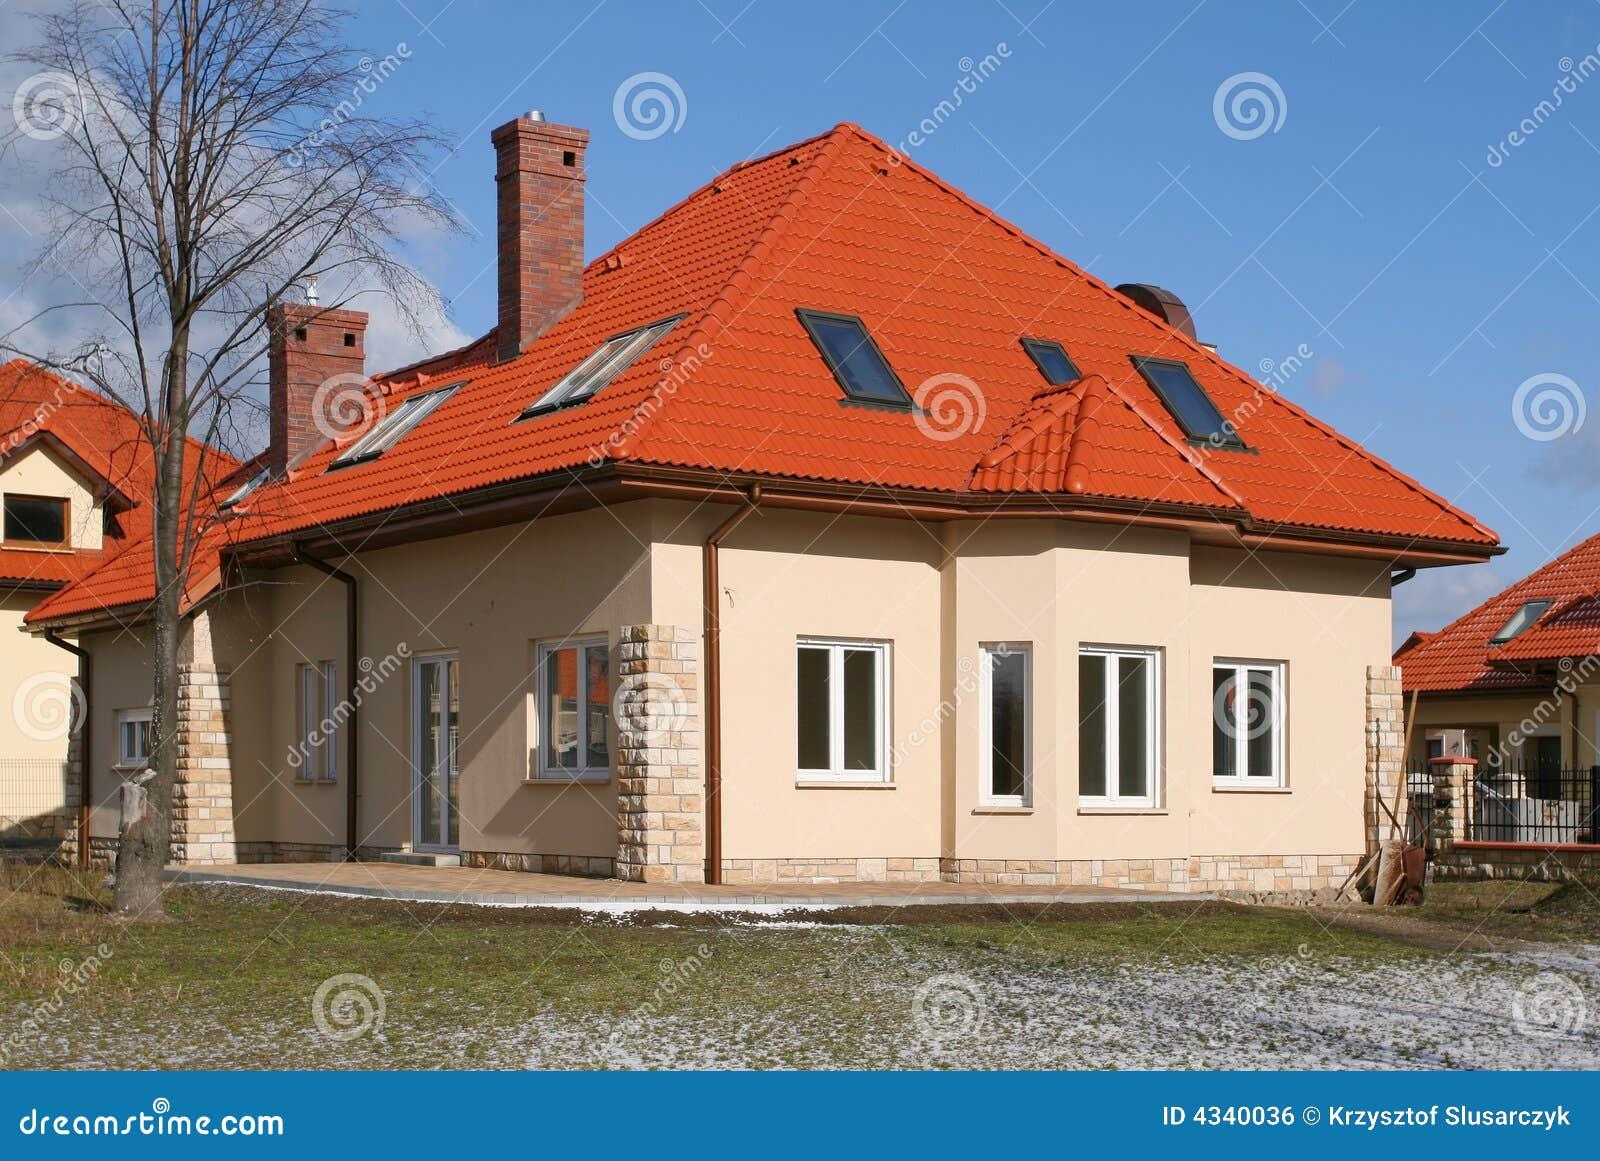 haus mit rotem dach lizenzfreies stockbild bild 4340036. Black Bedroom Furniture Sets. Home Design Ideas